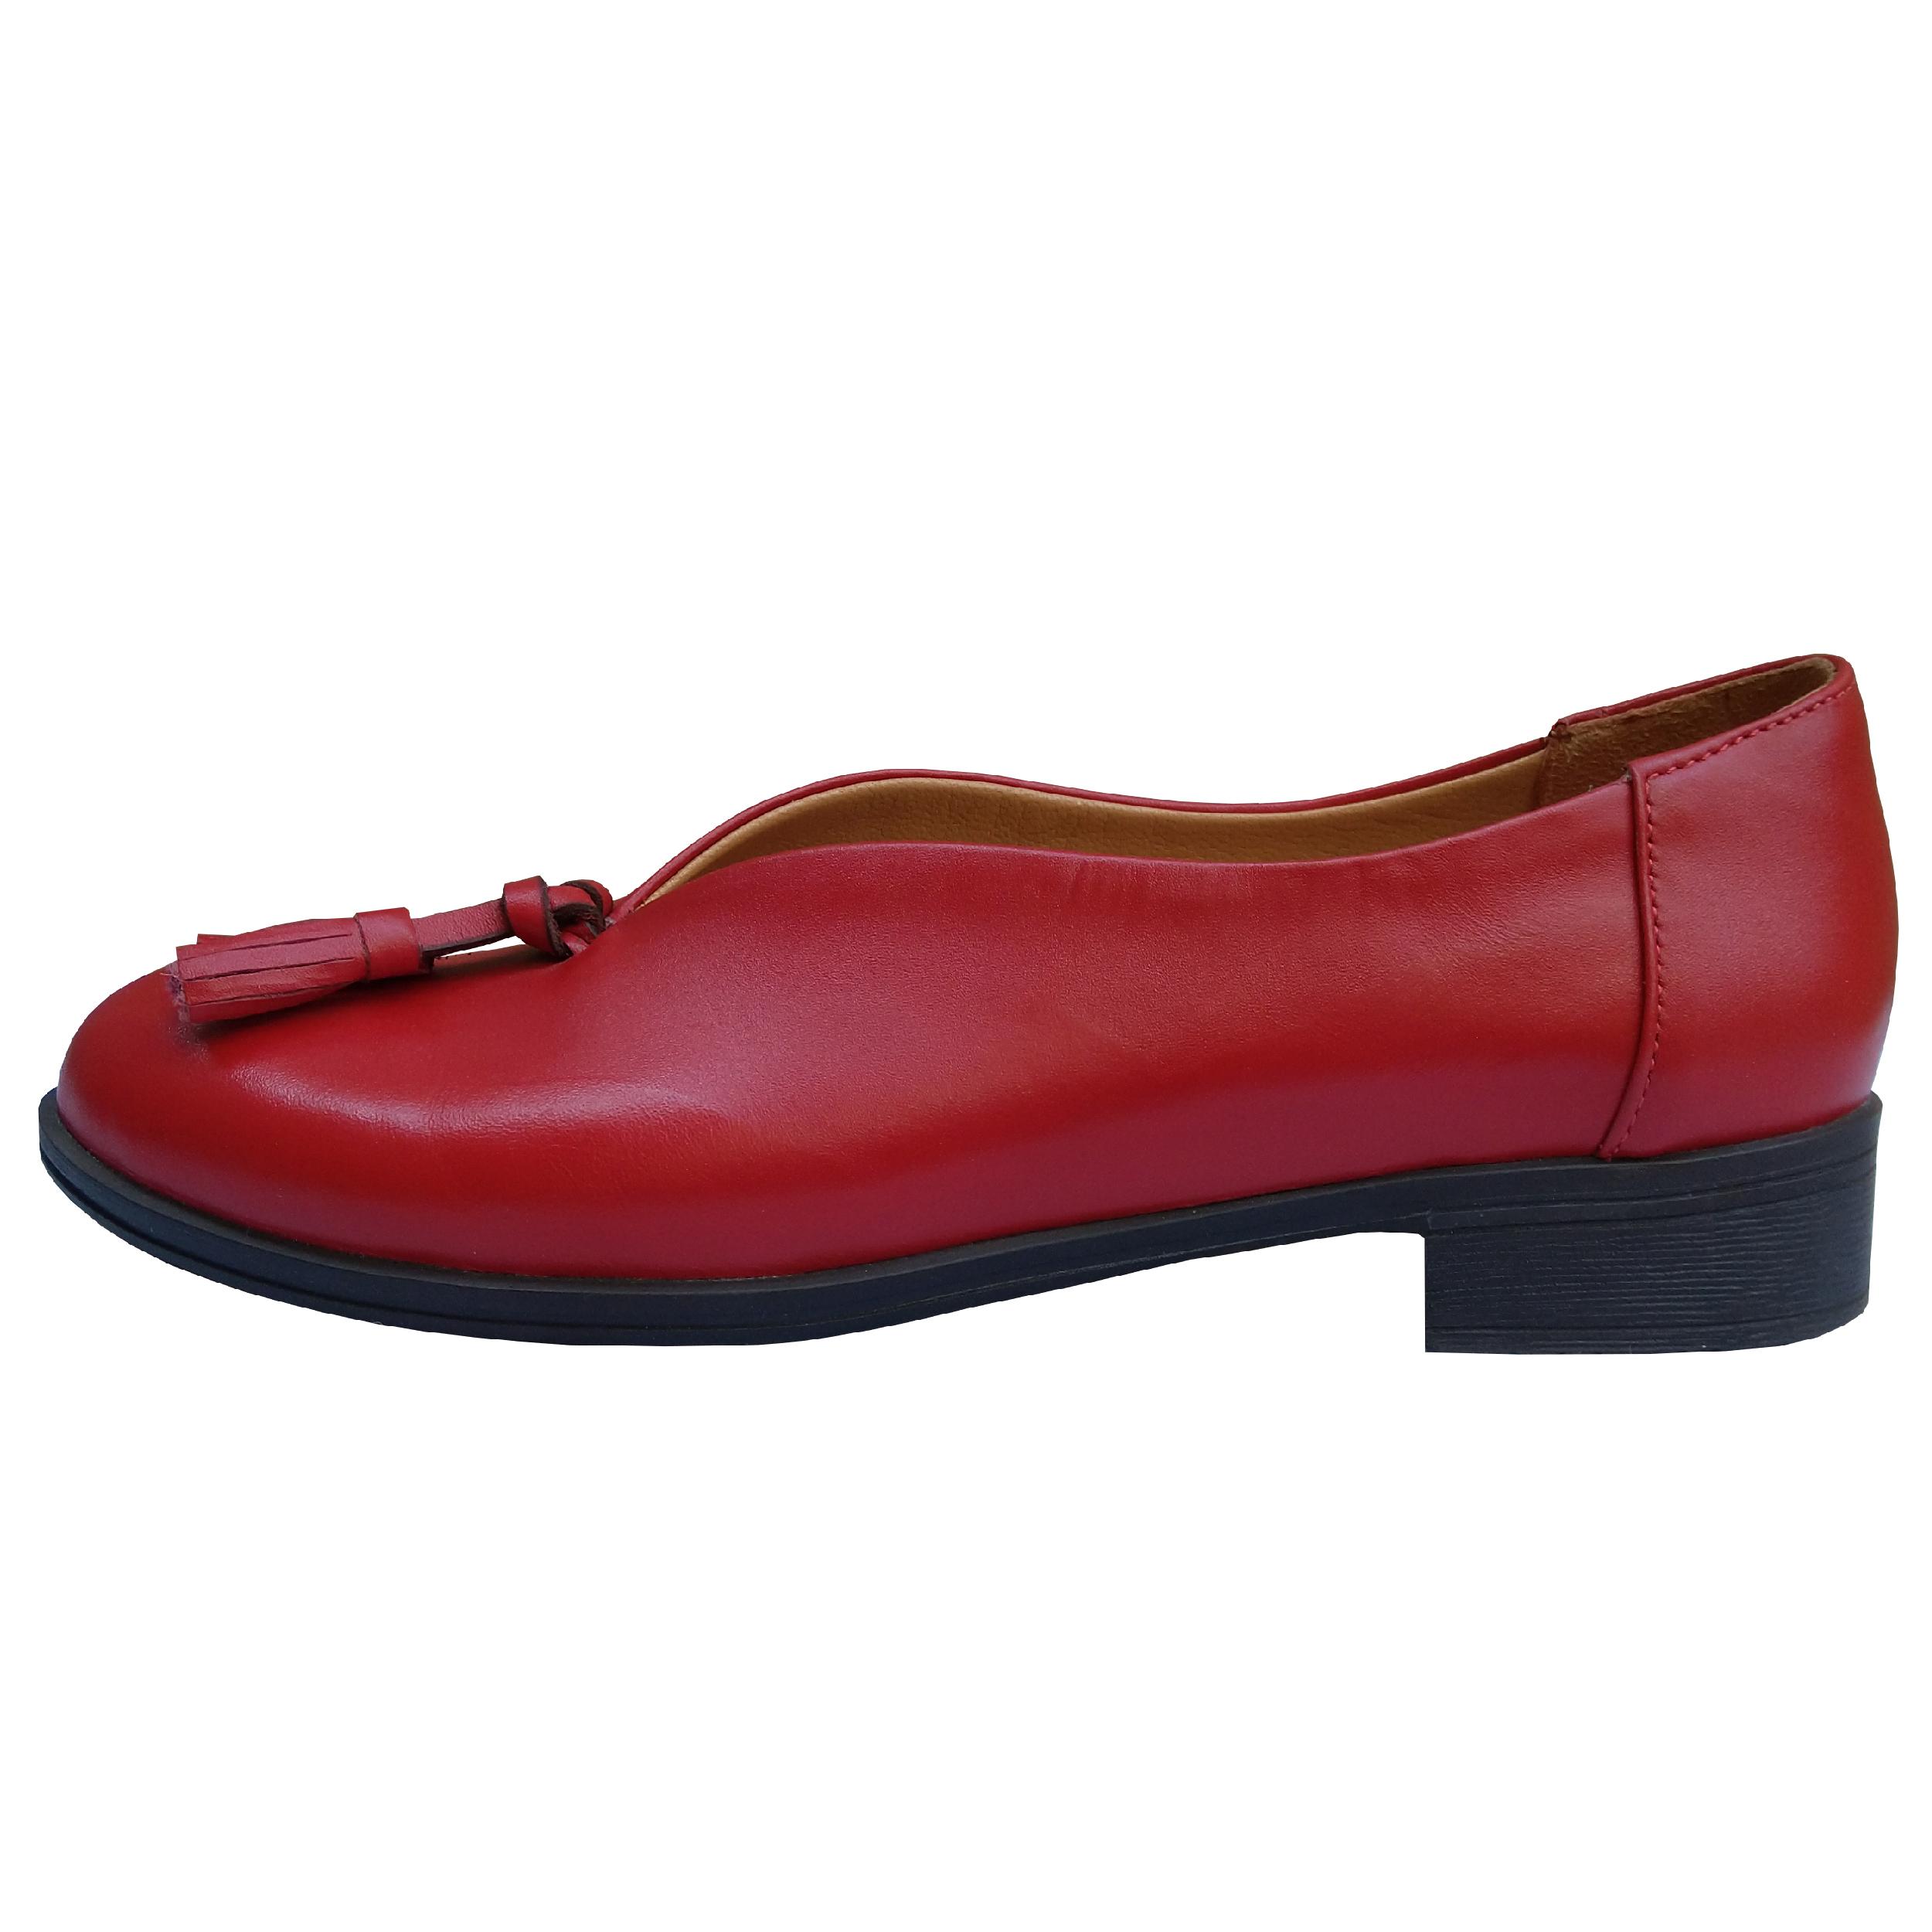 کفش زنانه مدل SK 309 -  - 2